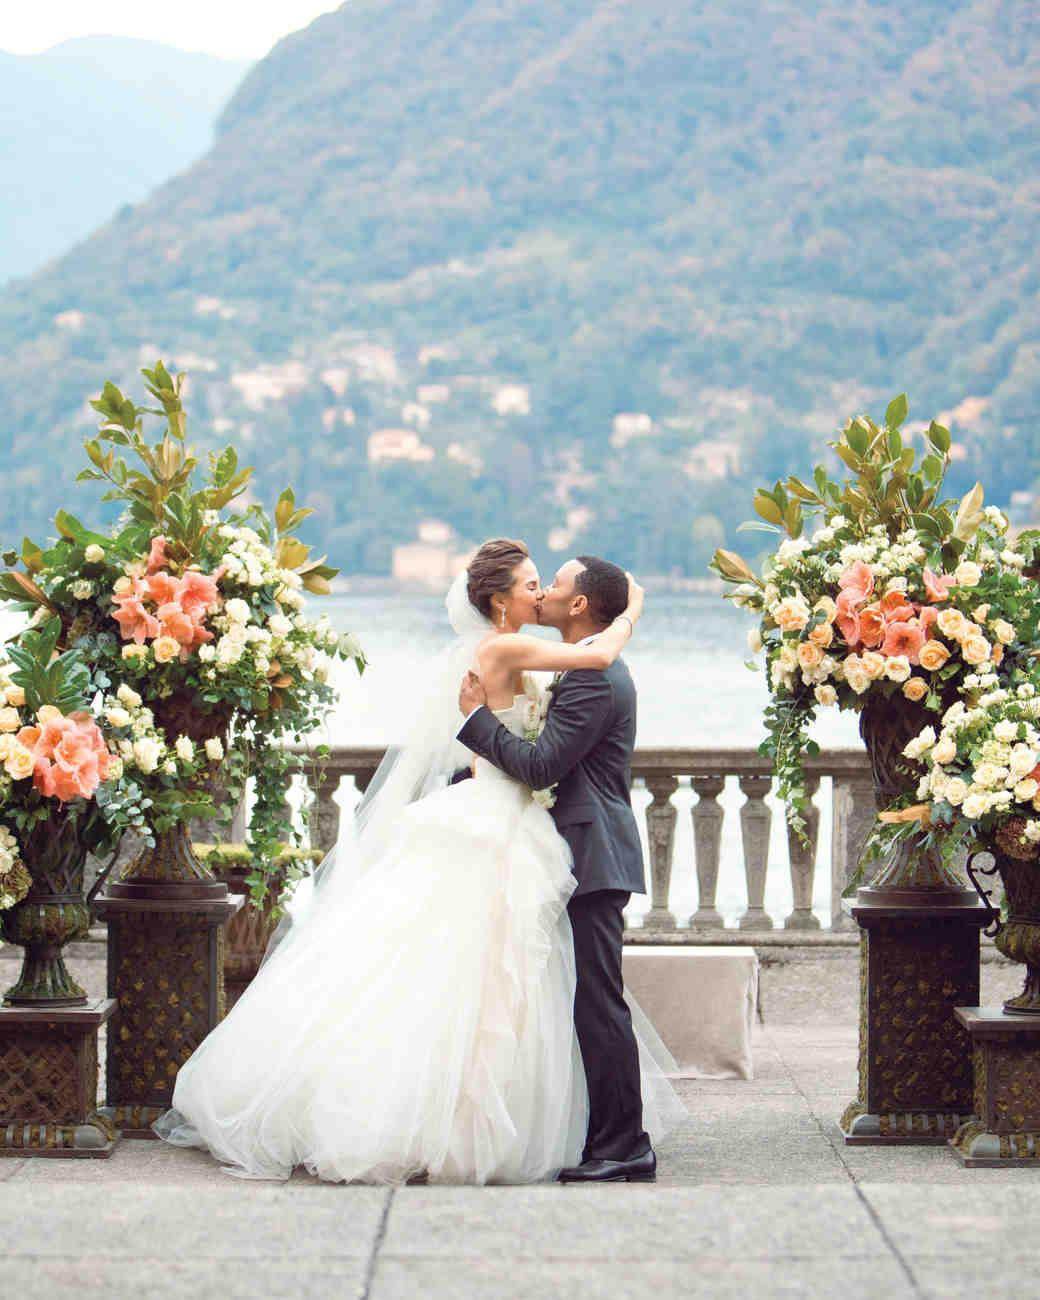 13 Drool-Worthy Celeb Wedding Dresses | Showpo Edit